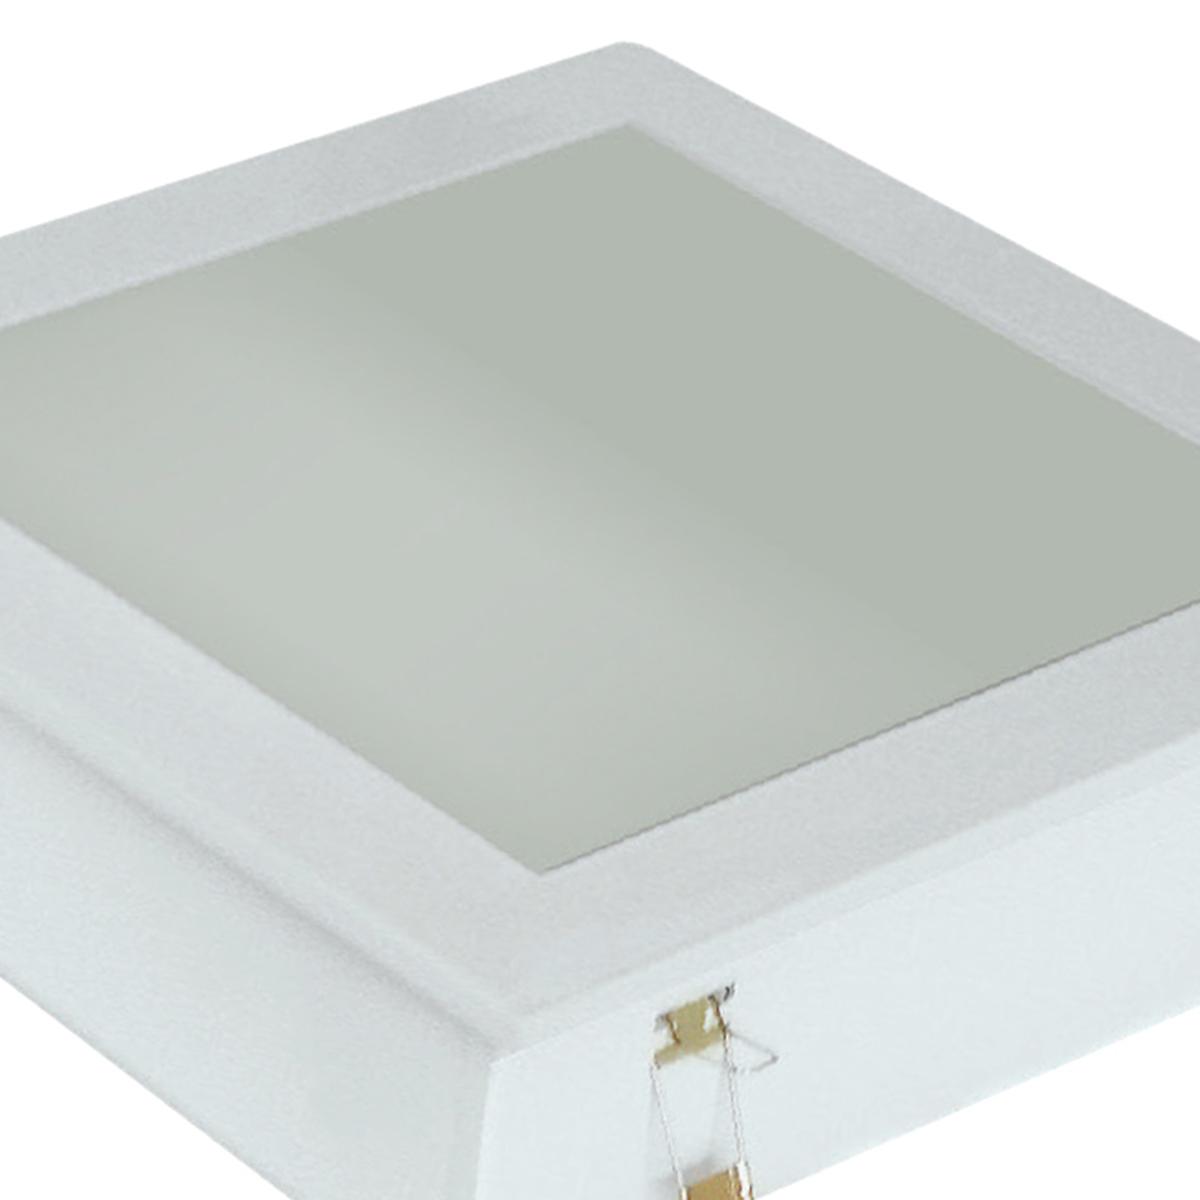 Plafon Space Emb. Quad. 20cm Alum. Vidro Fosco E-27 1 Lamp. Max 60w Branco